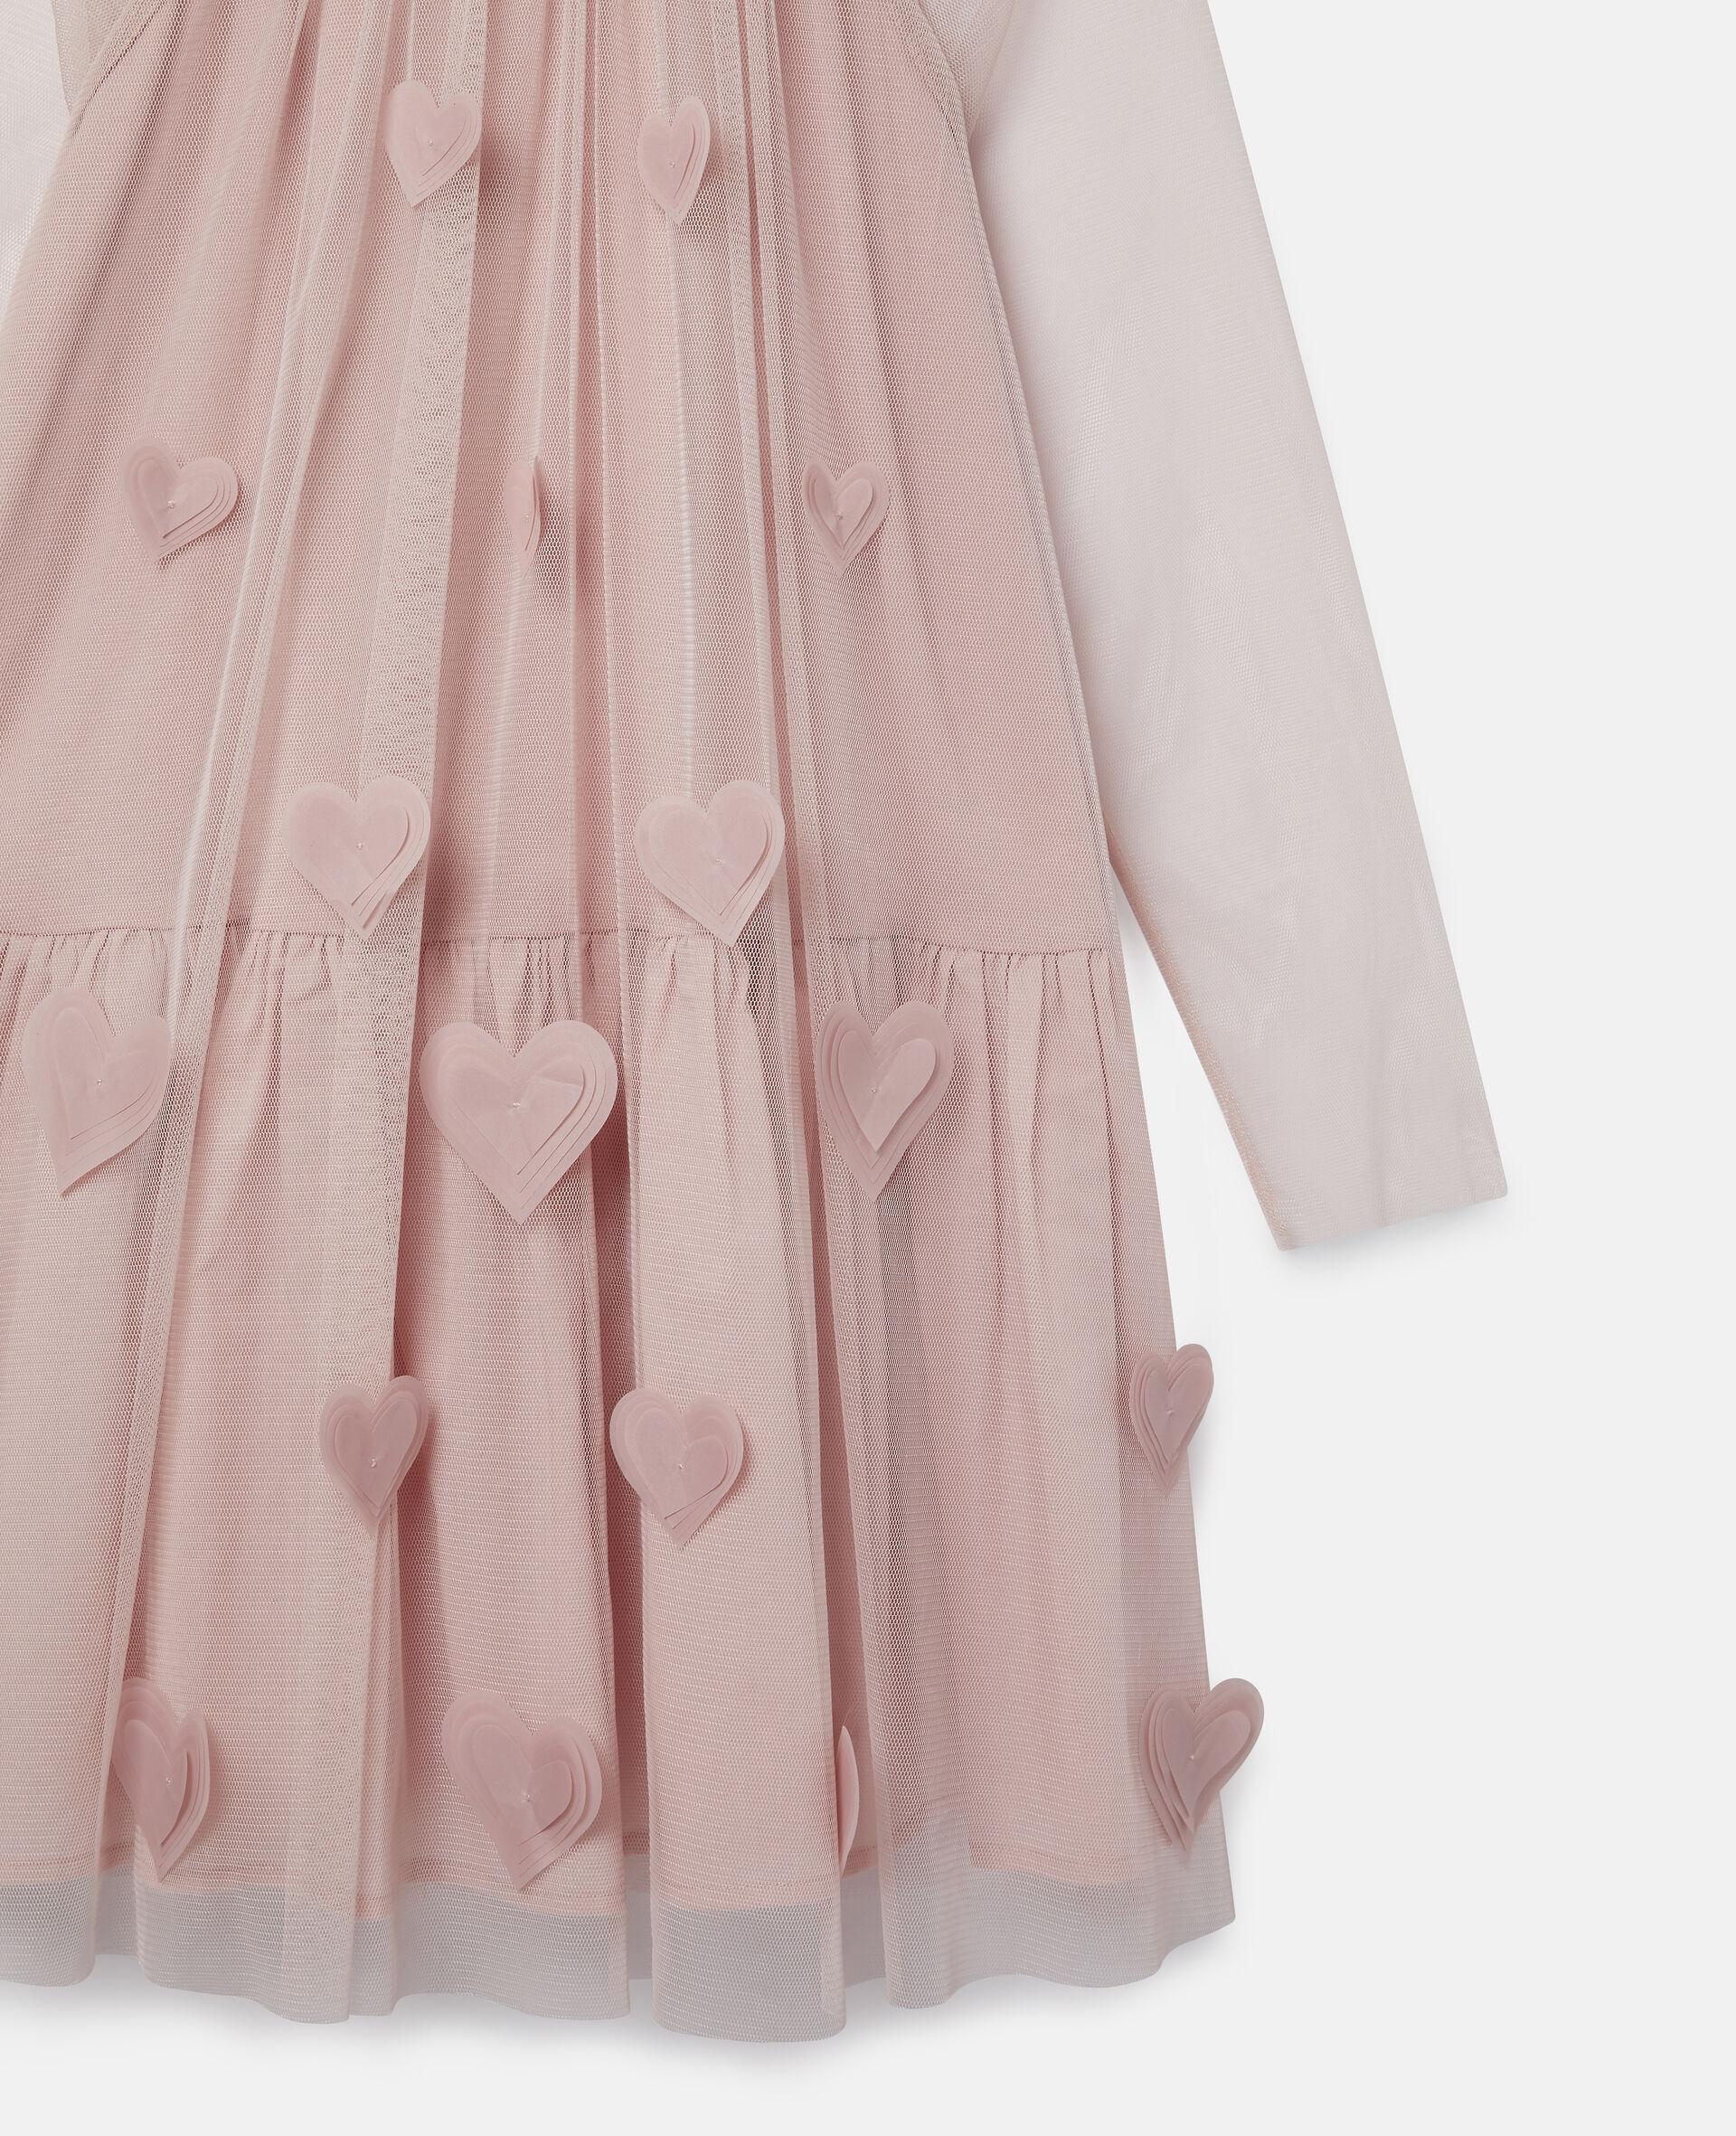 3D Hearts Tulle Dress-Pink-large image number 1